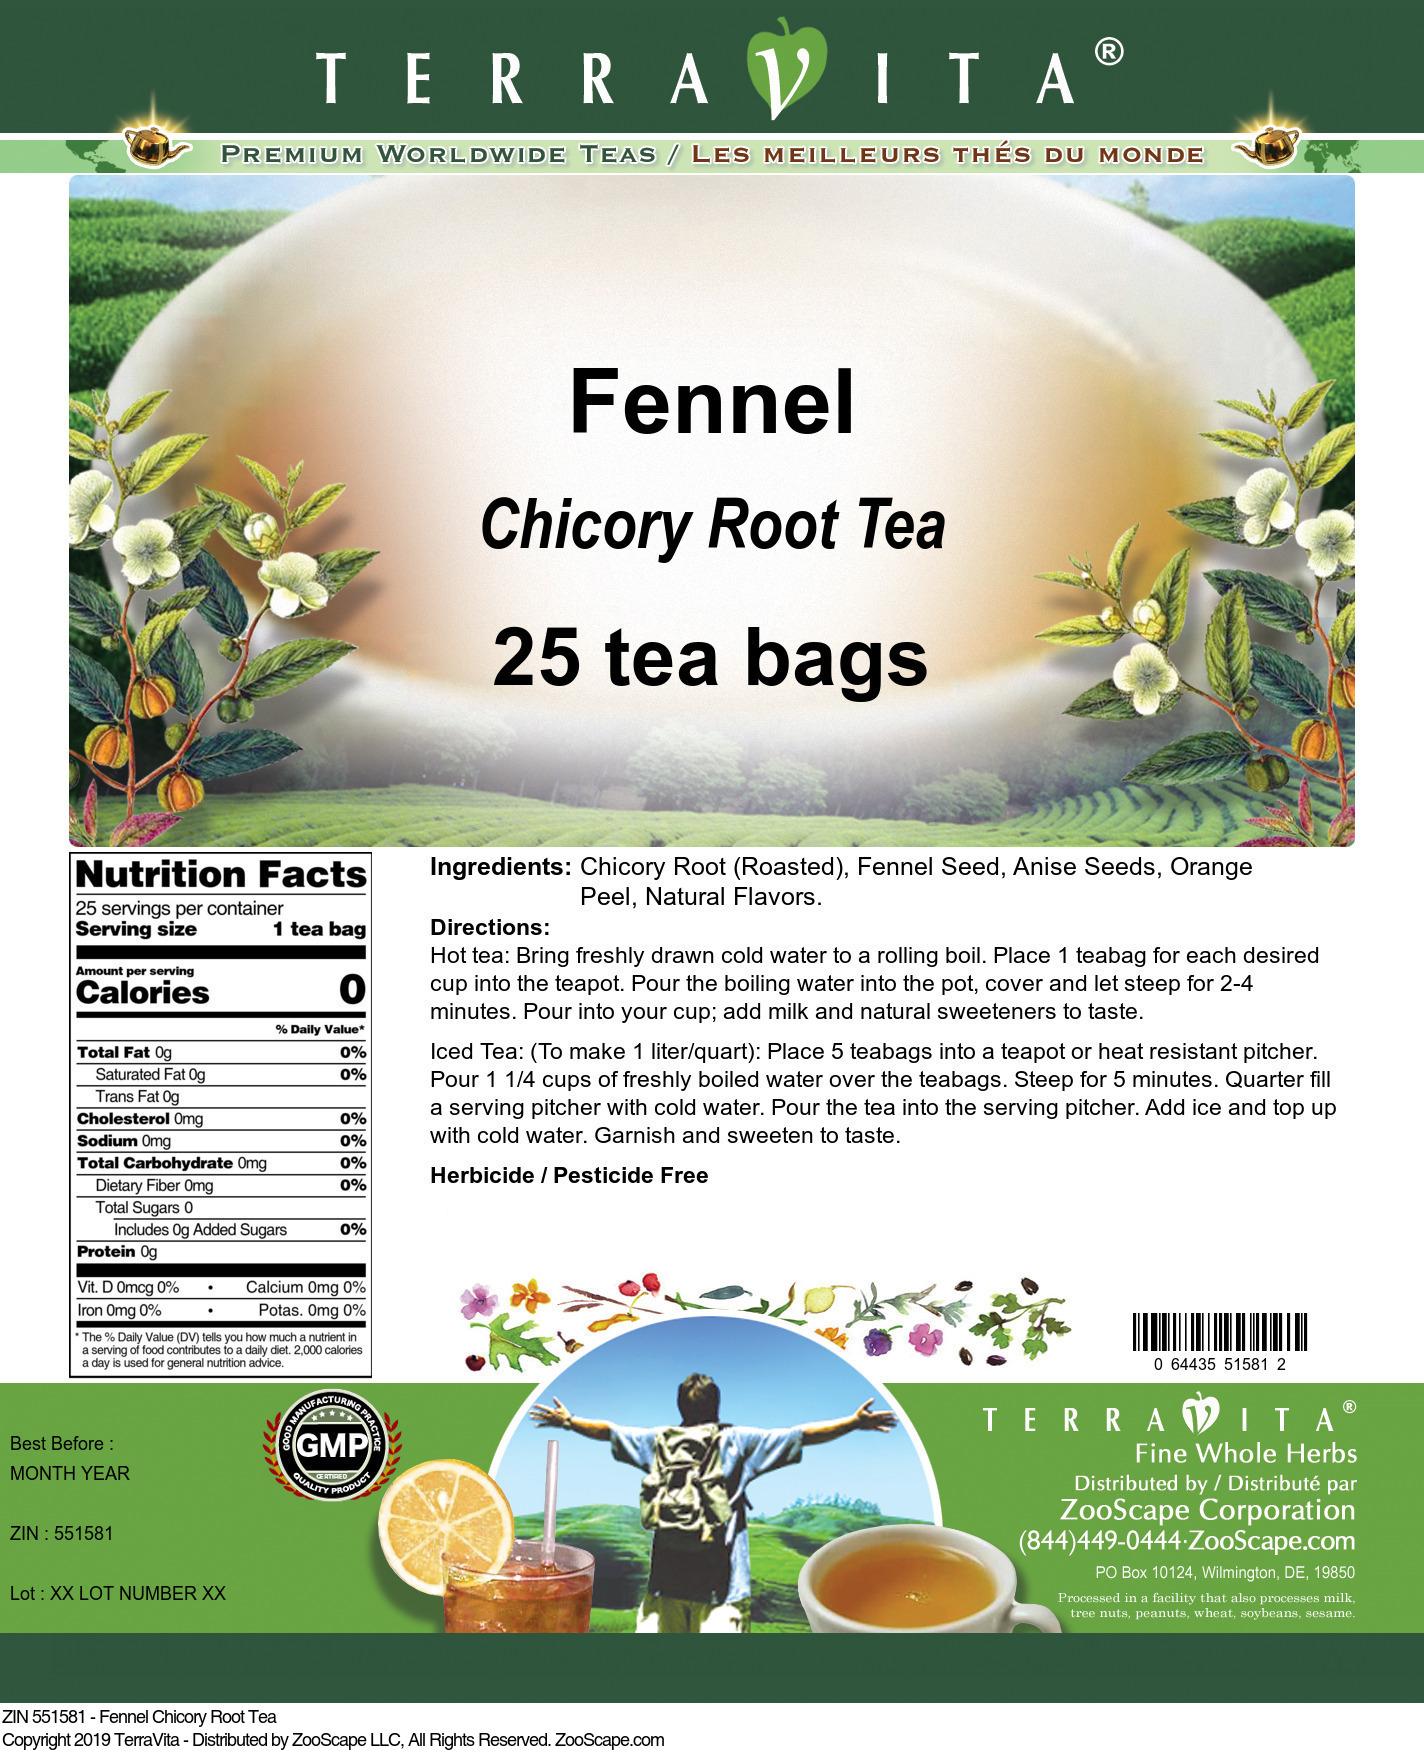 Fennel Chicory Root Tea